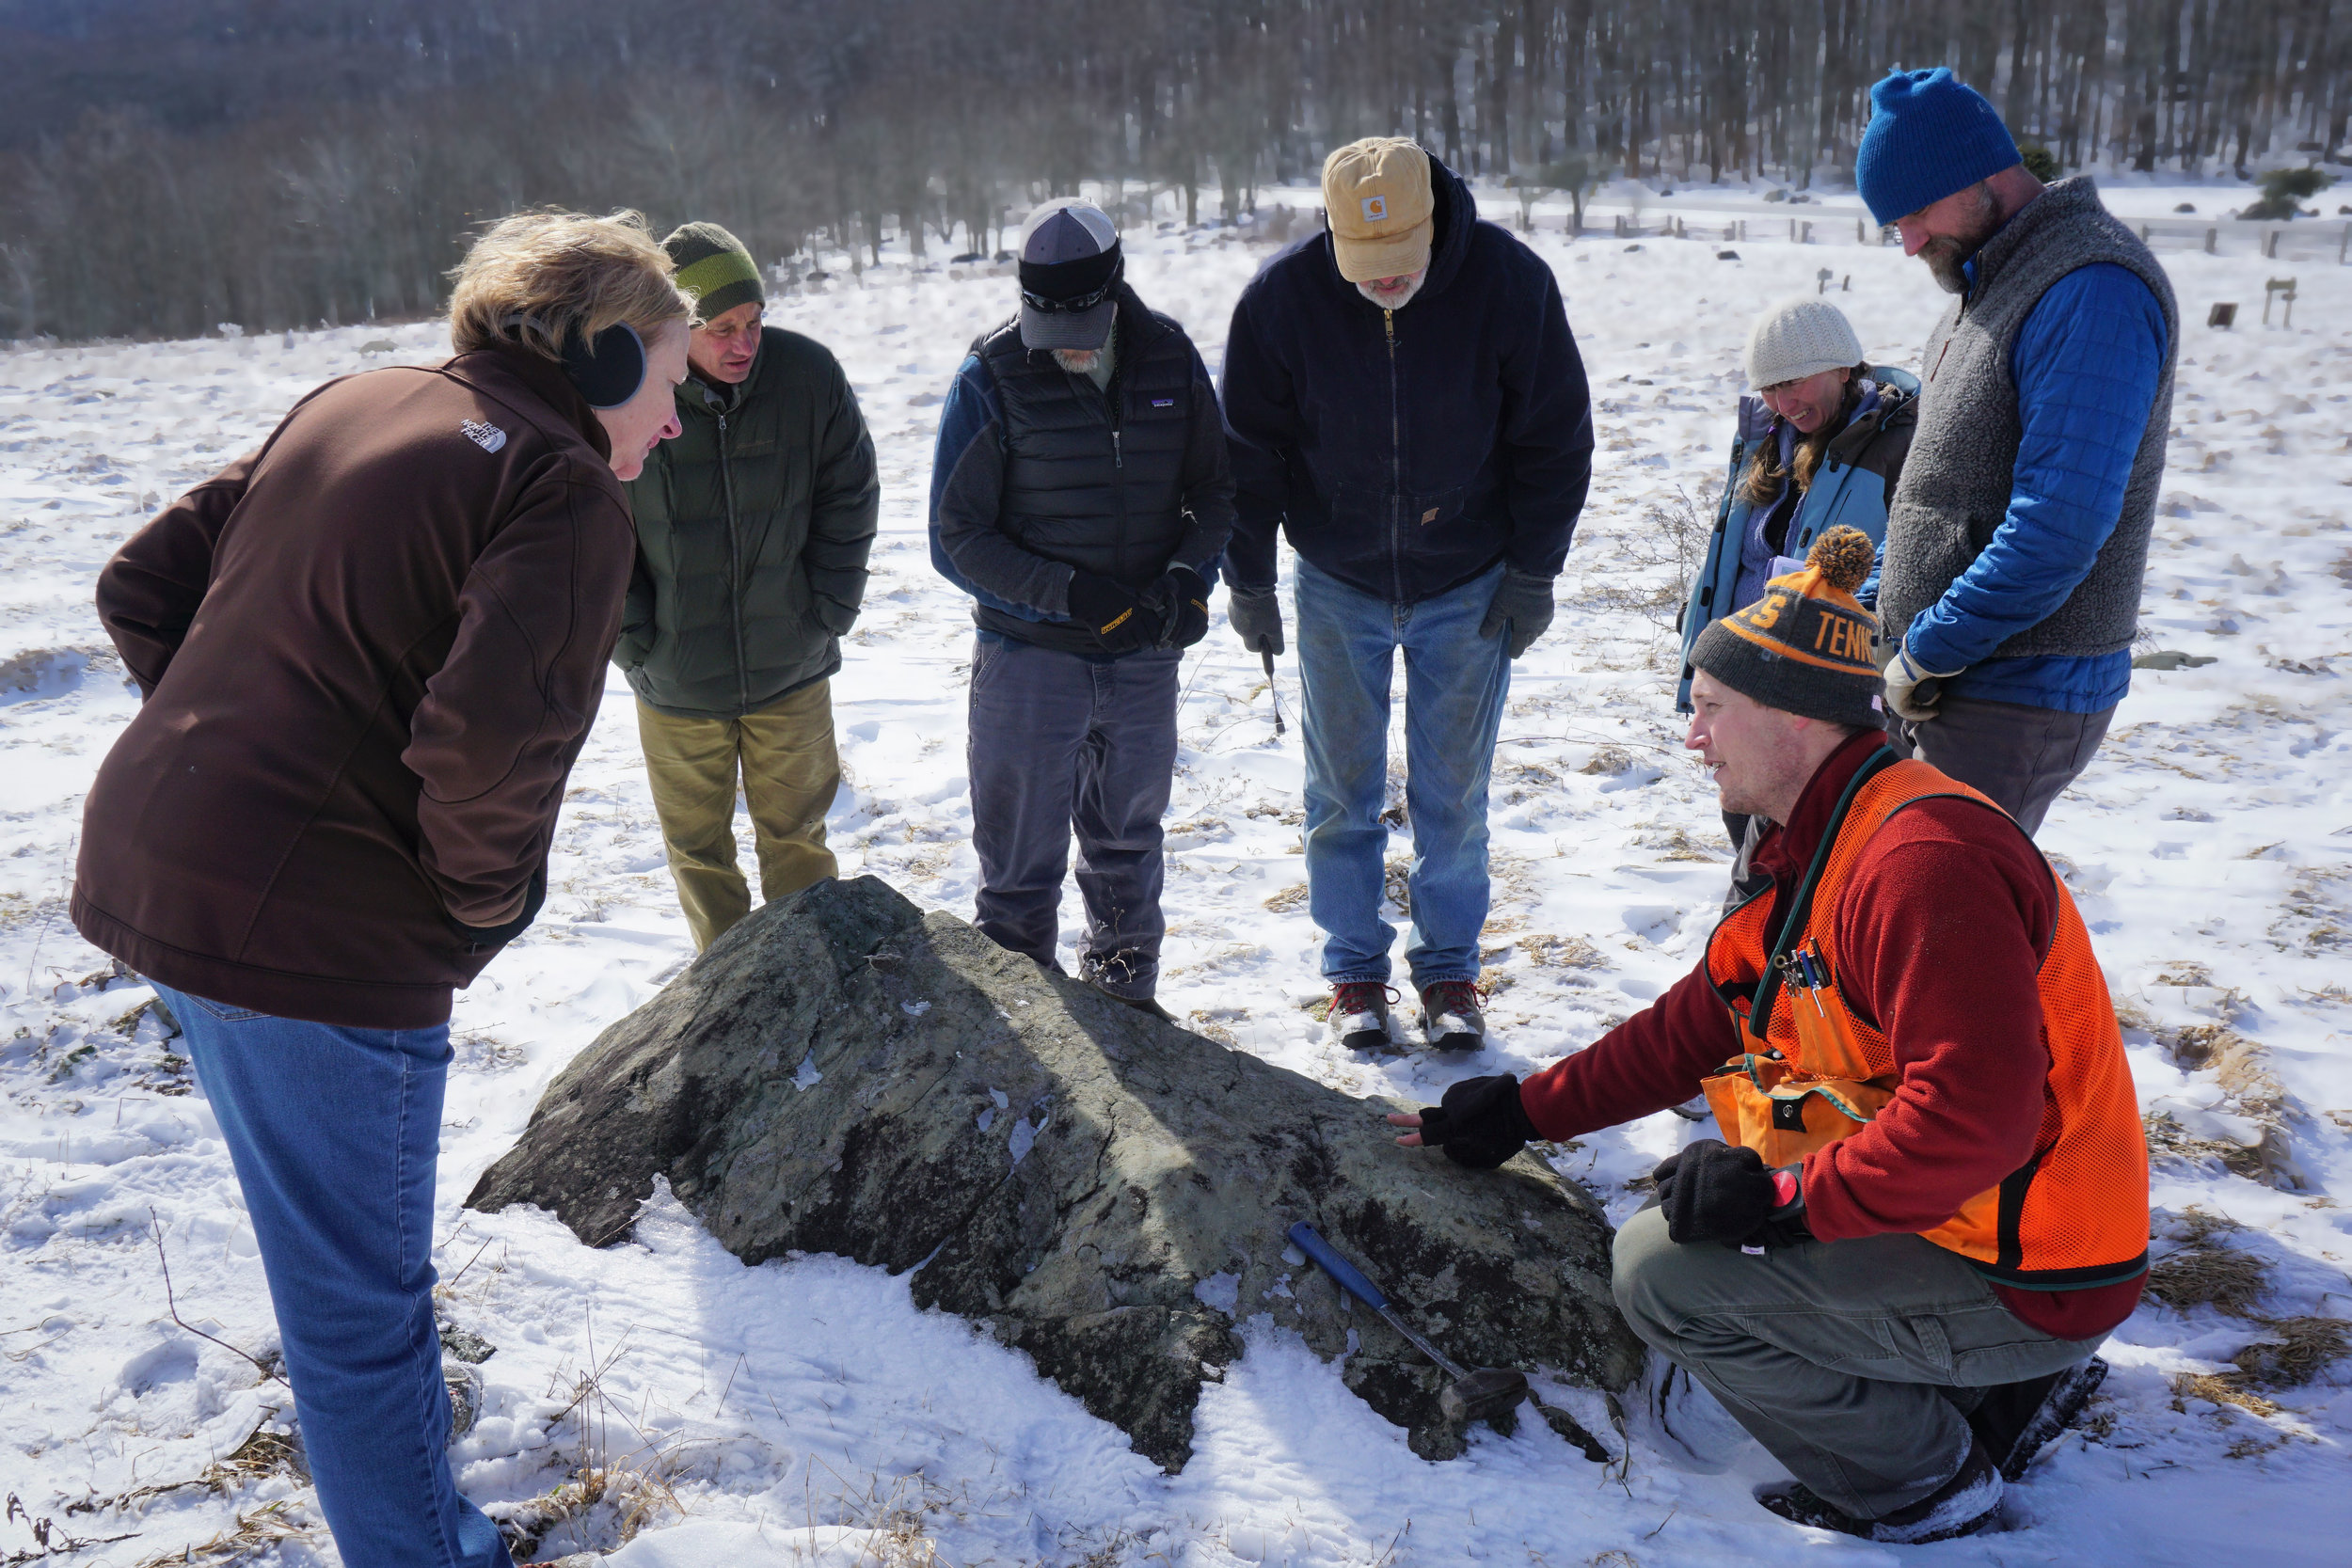 Geologist Dr. Arthur Merschat describes the greenstone at Elk Garden.